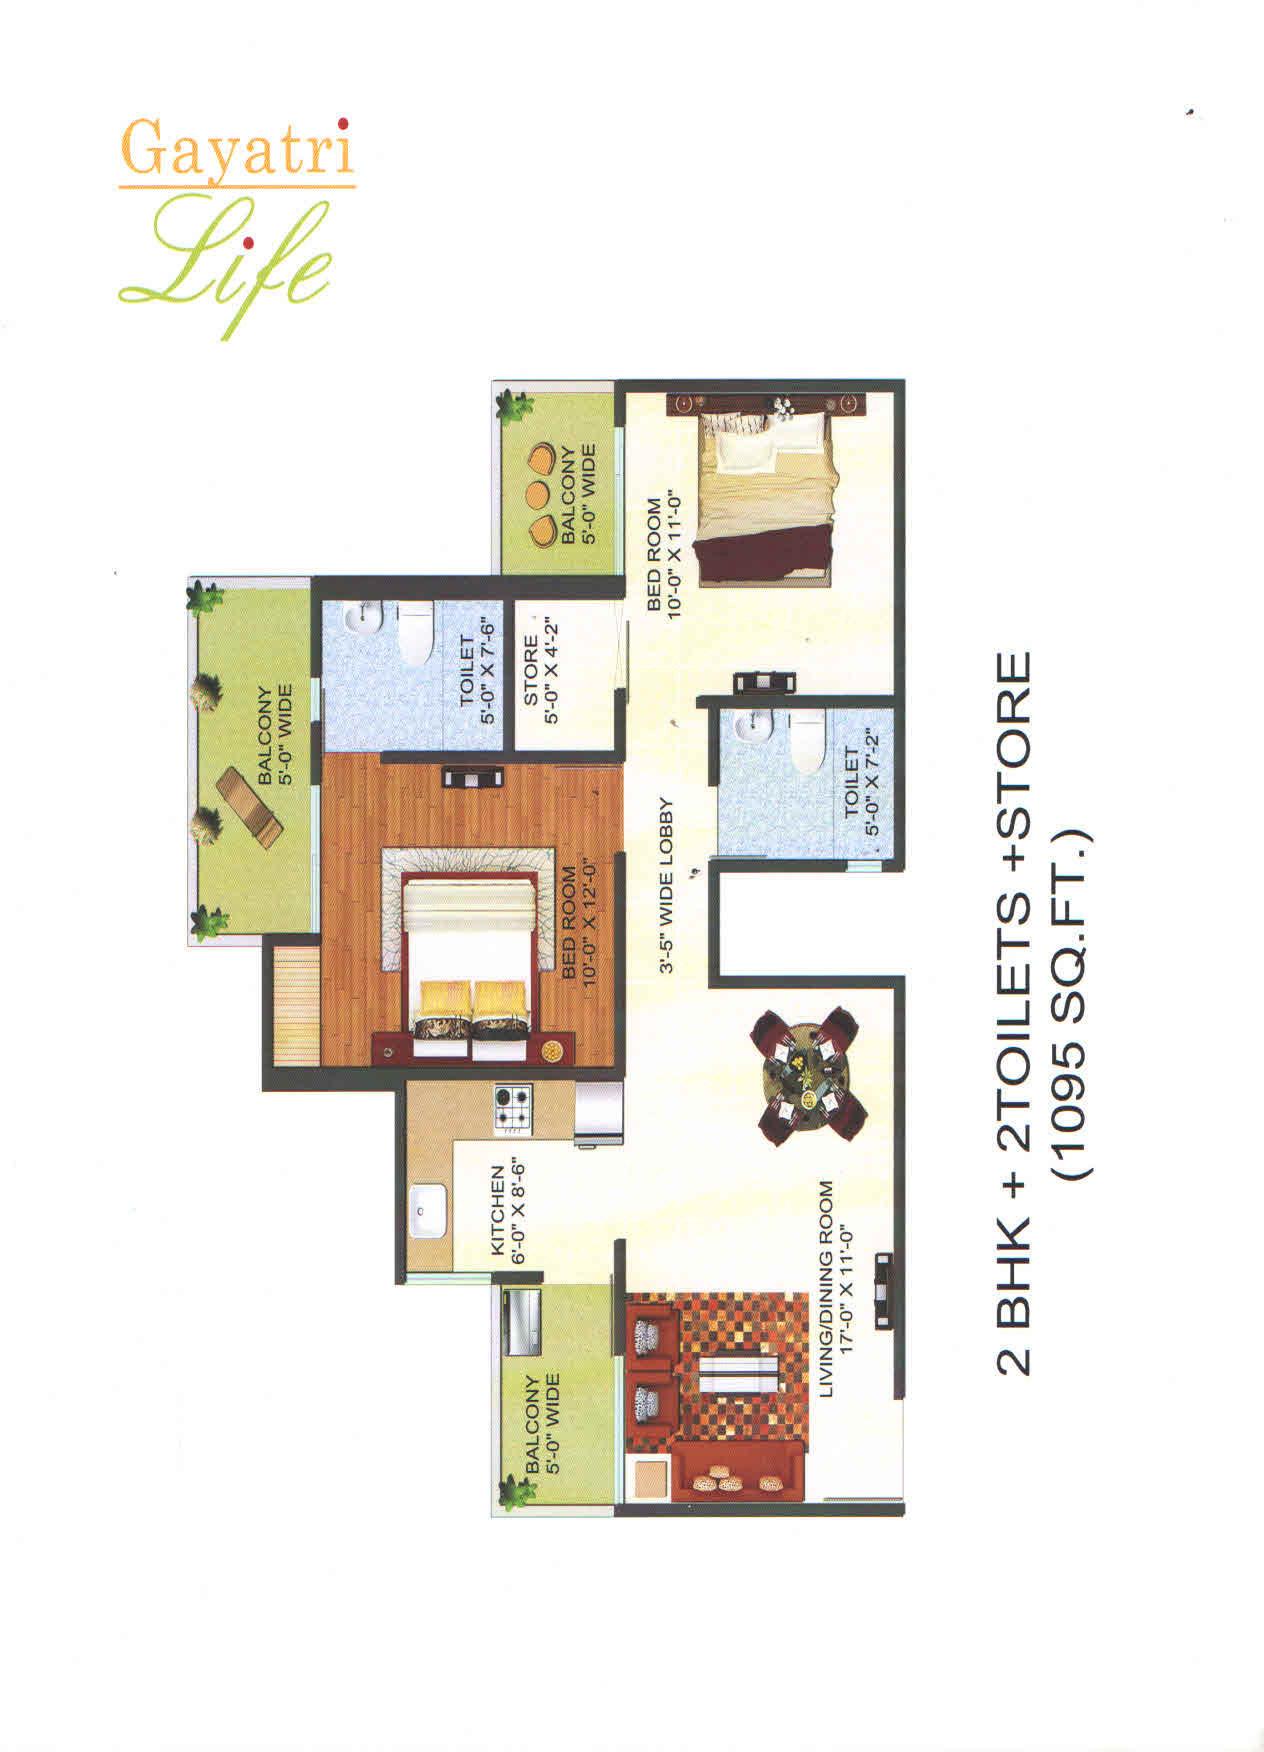 gayatri life floor plan3